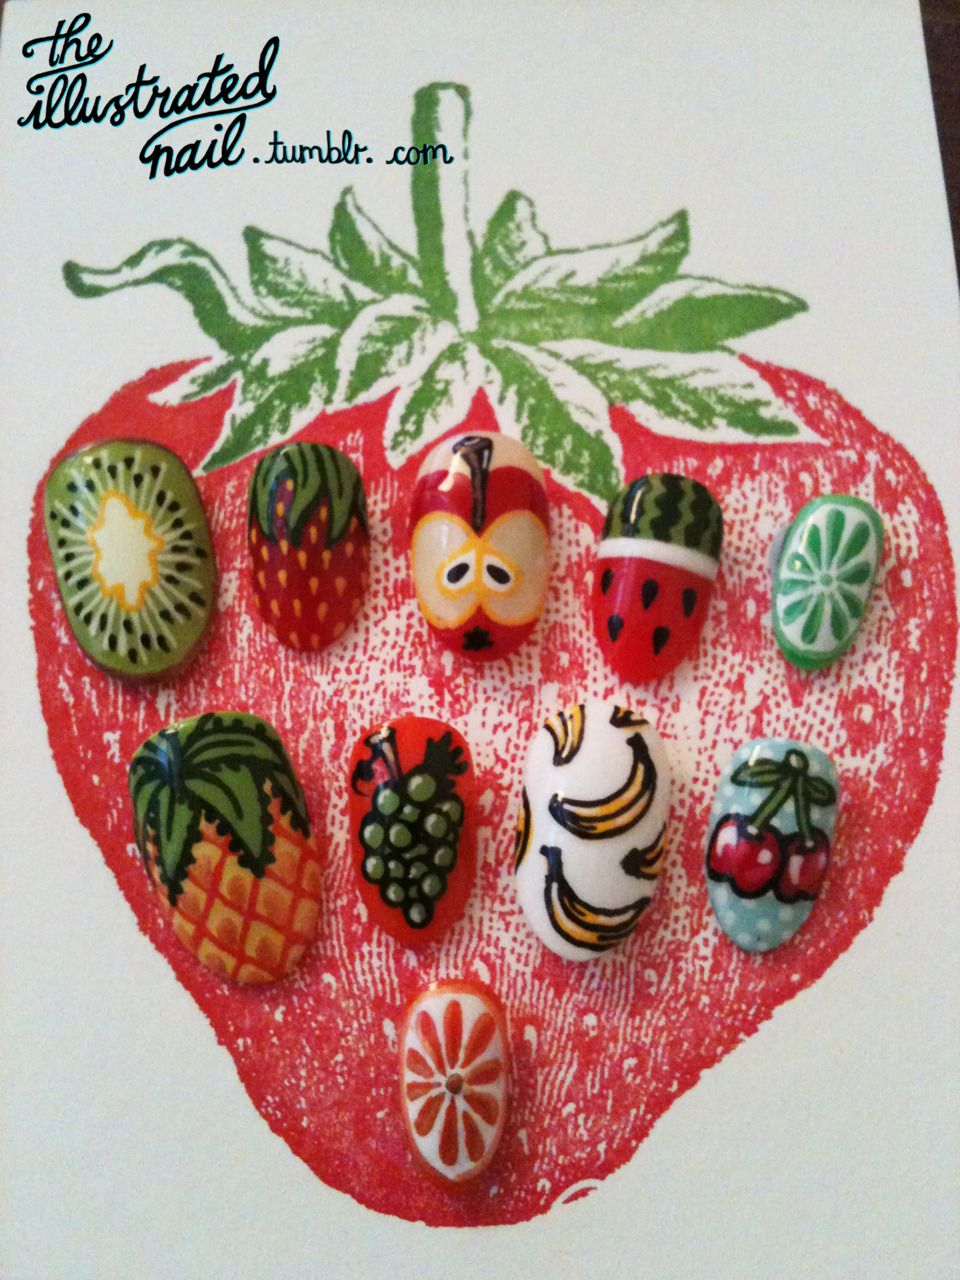 Fruity nail tips for Rita's Brazilian adventure via The Illustrated Nail